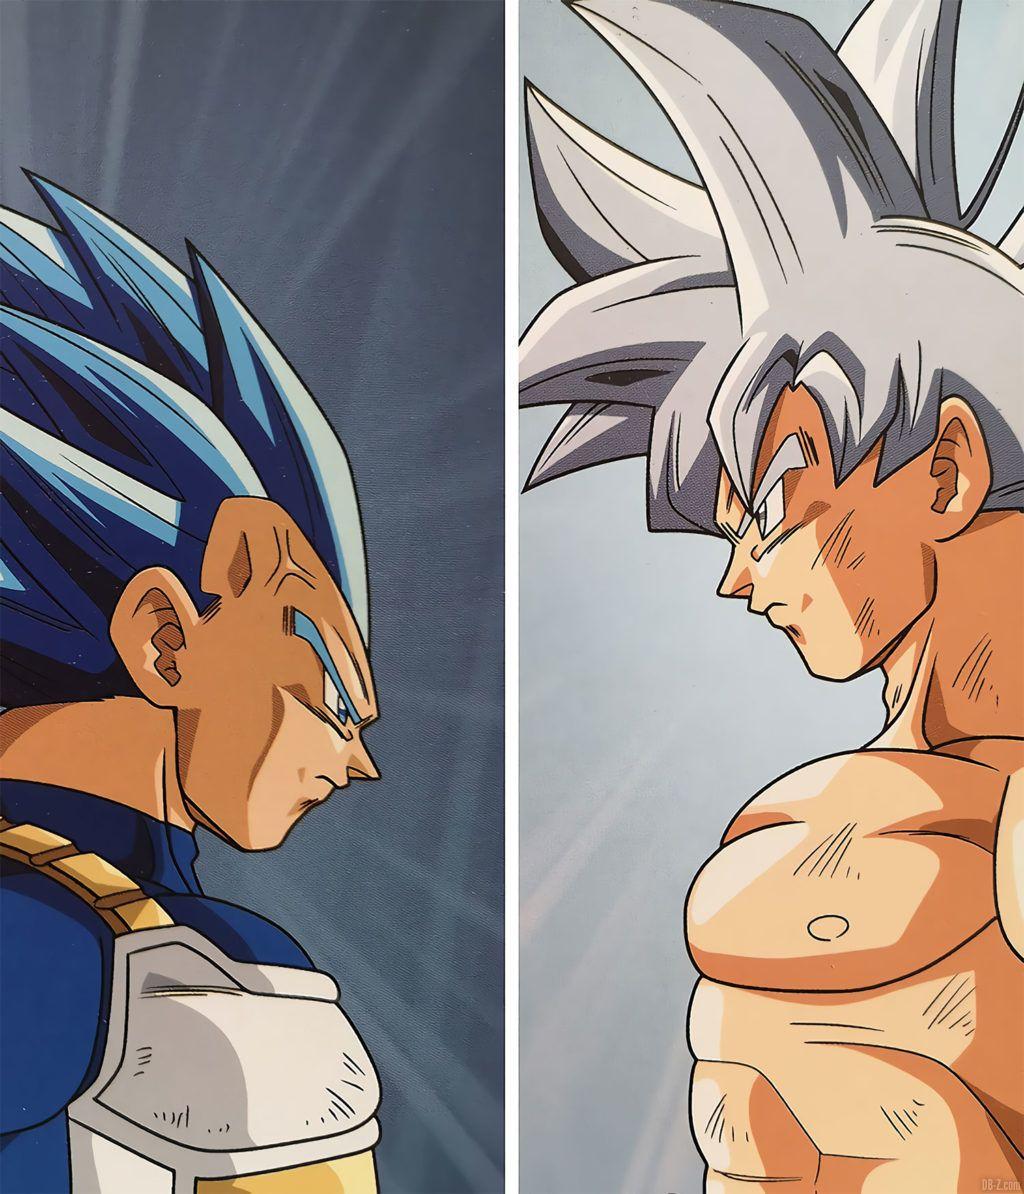 Calendrier Dragon Ball Super 2020 Goku Ultra Instinct vs Vegeta SSB avancé